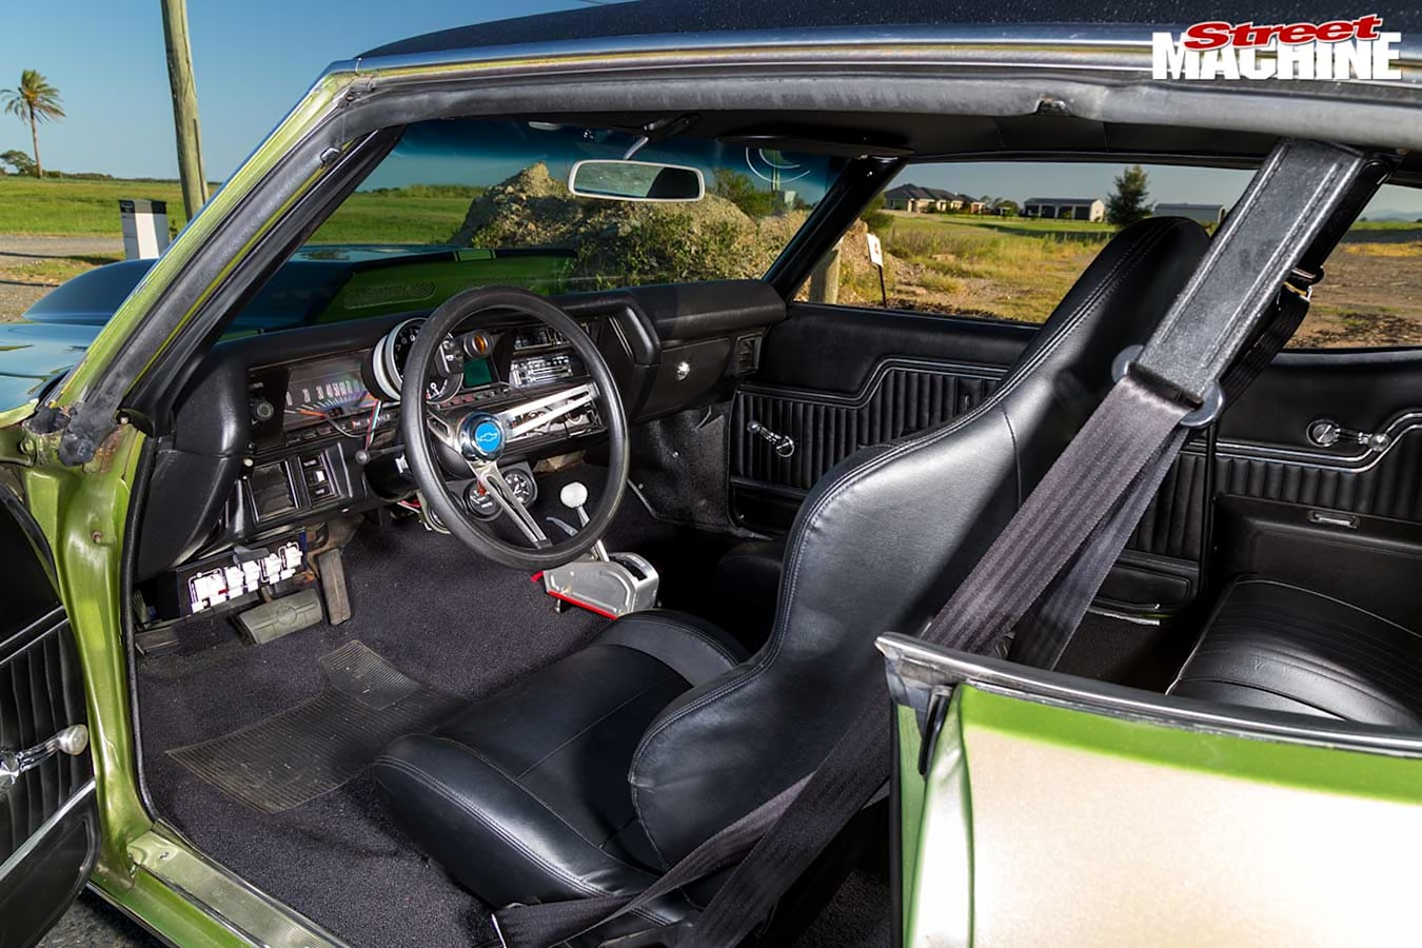 Chevrolet Chevelle interior